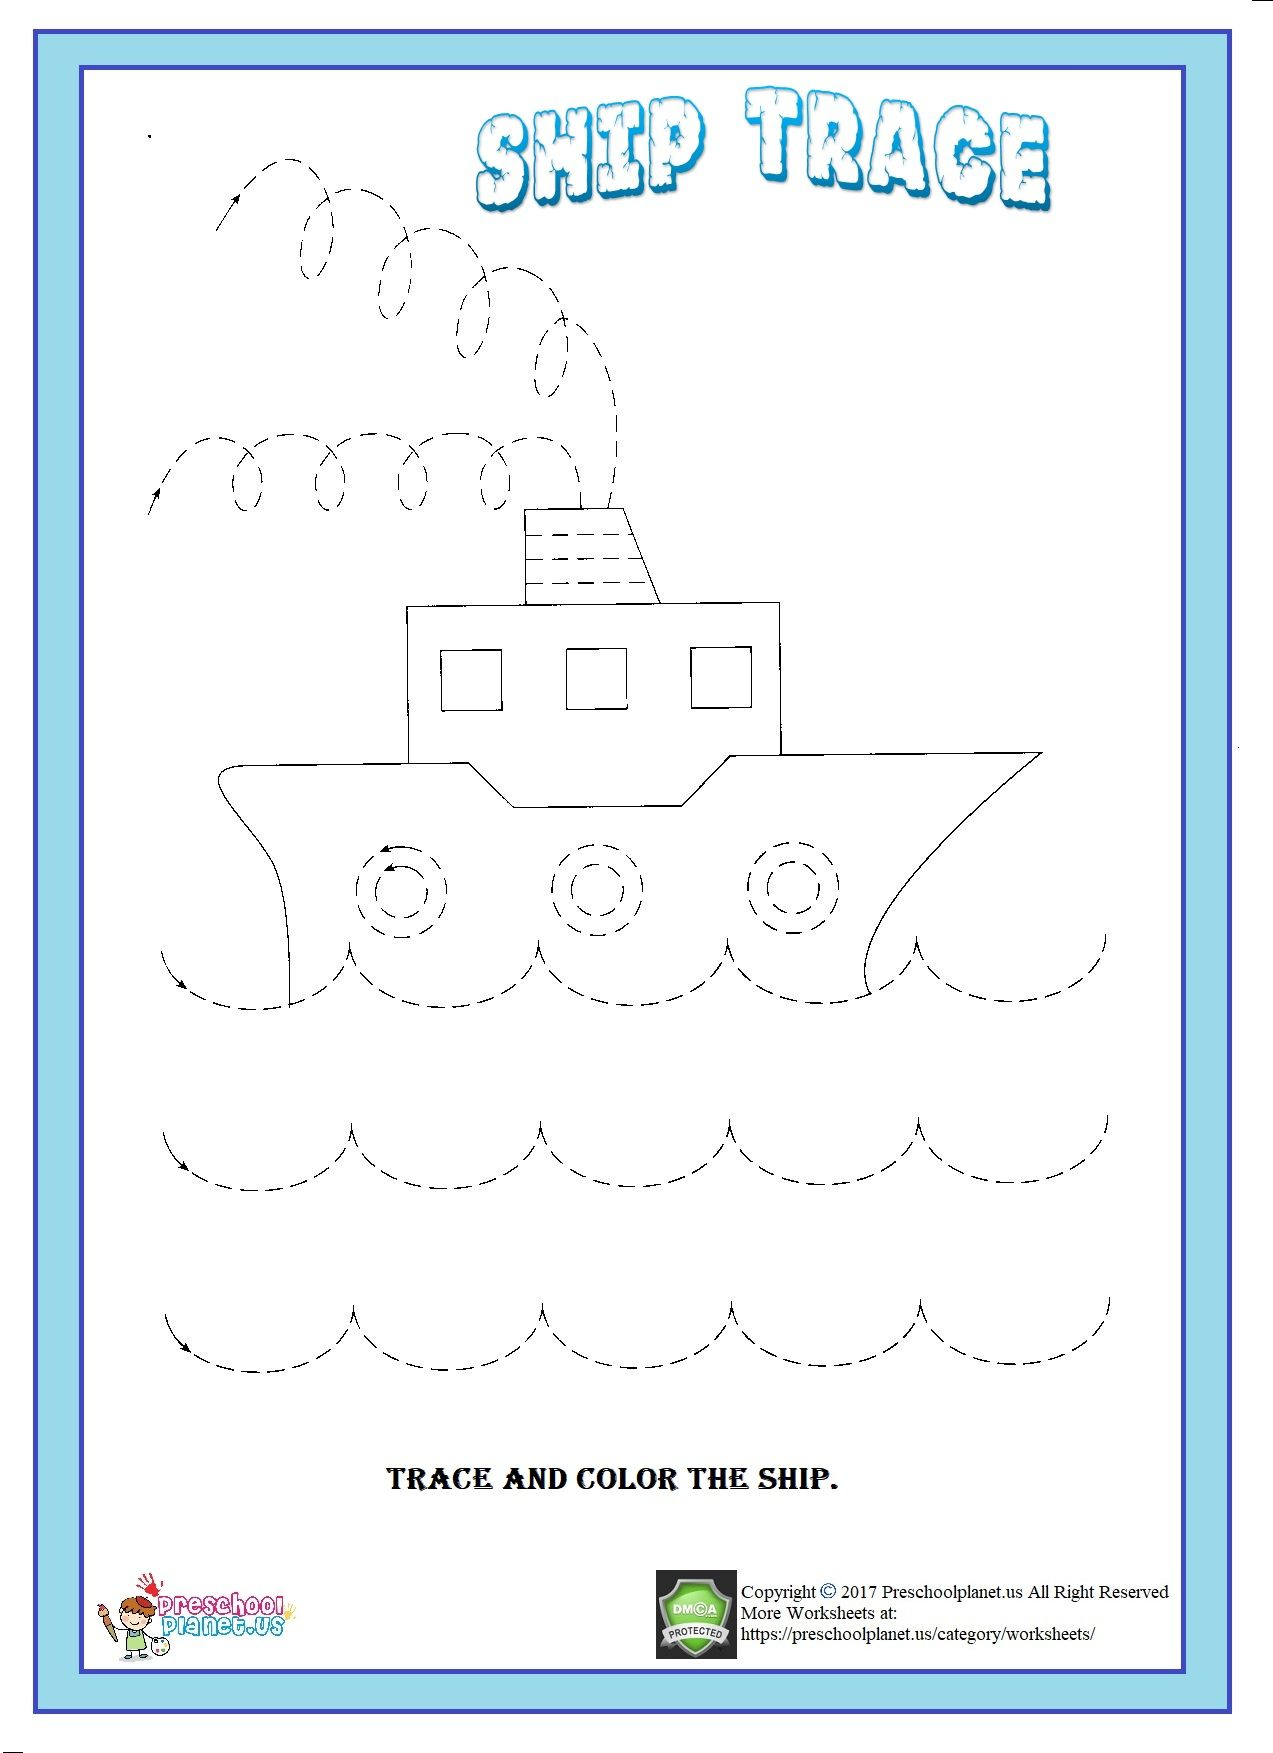 Ship Trace Worksheet Kindergarten Worksheets Kindergarten Worksheets Printable Color Activities [ 1753 x 1273 Pixel ]